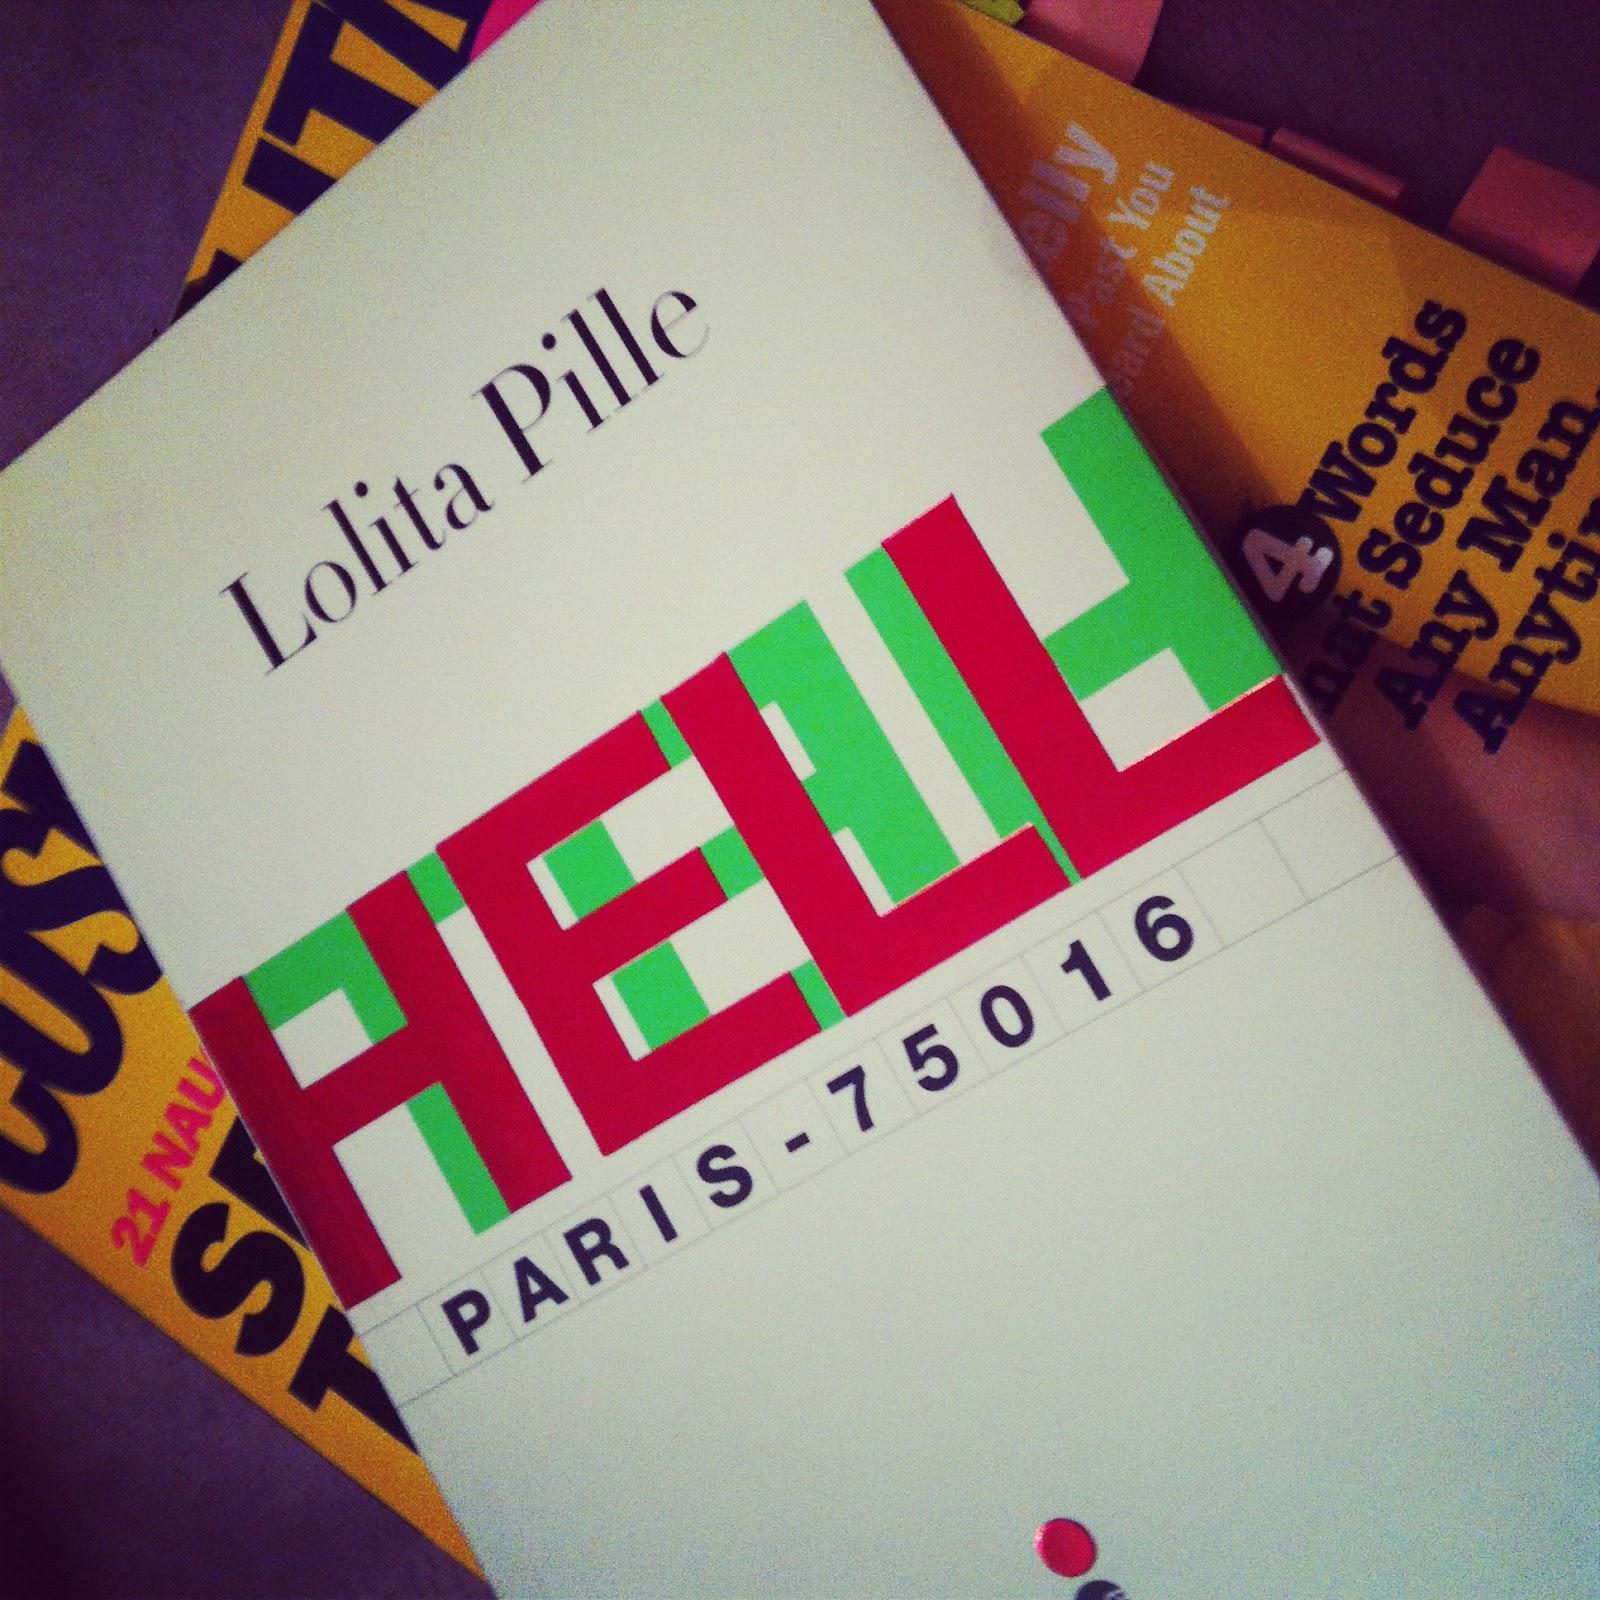 compra online, livro, hell paris, estante virtual,